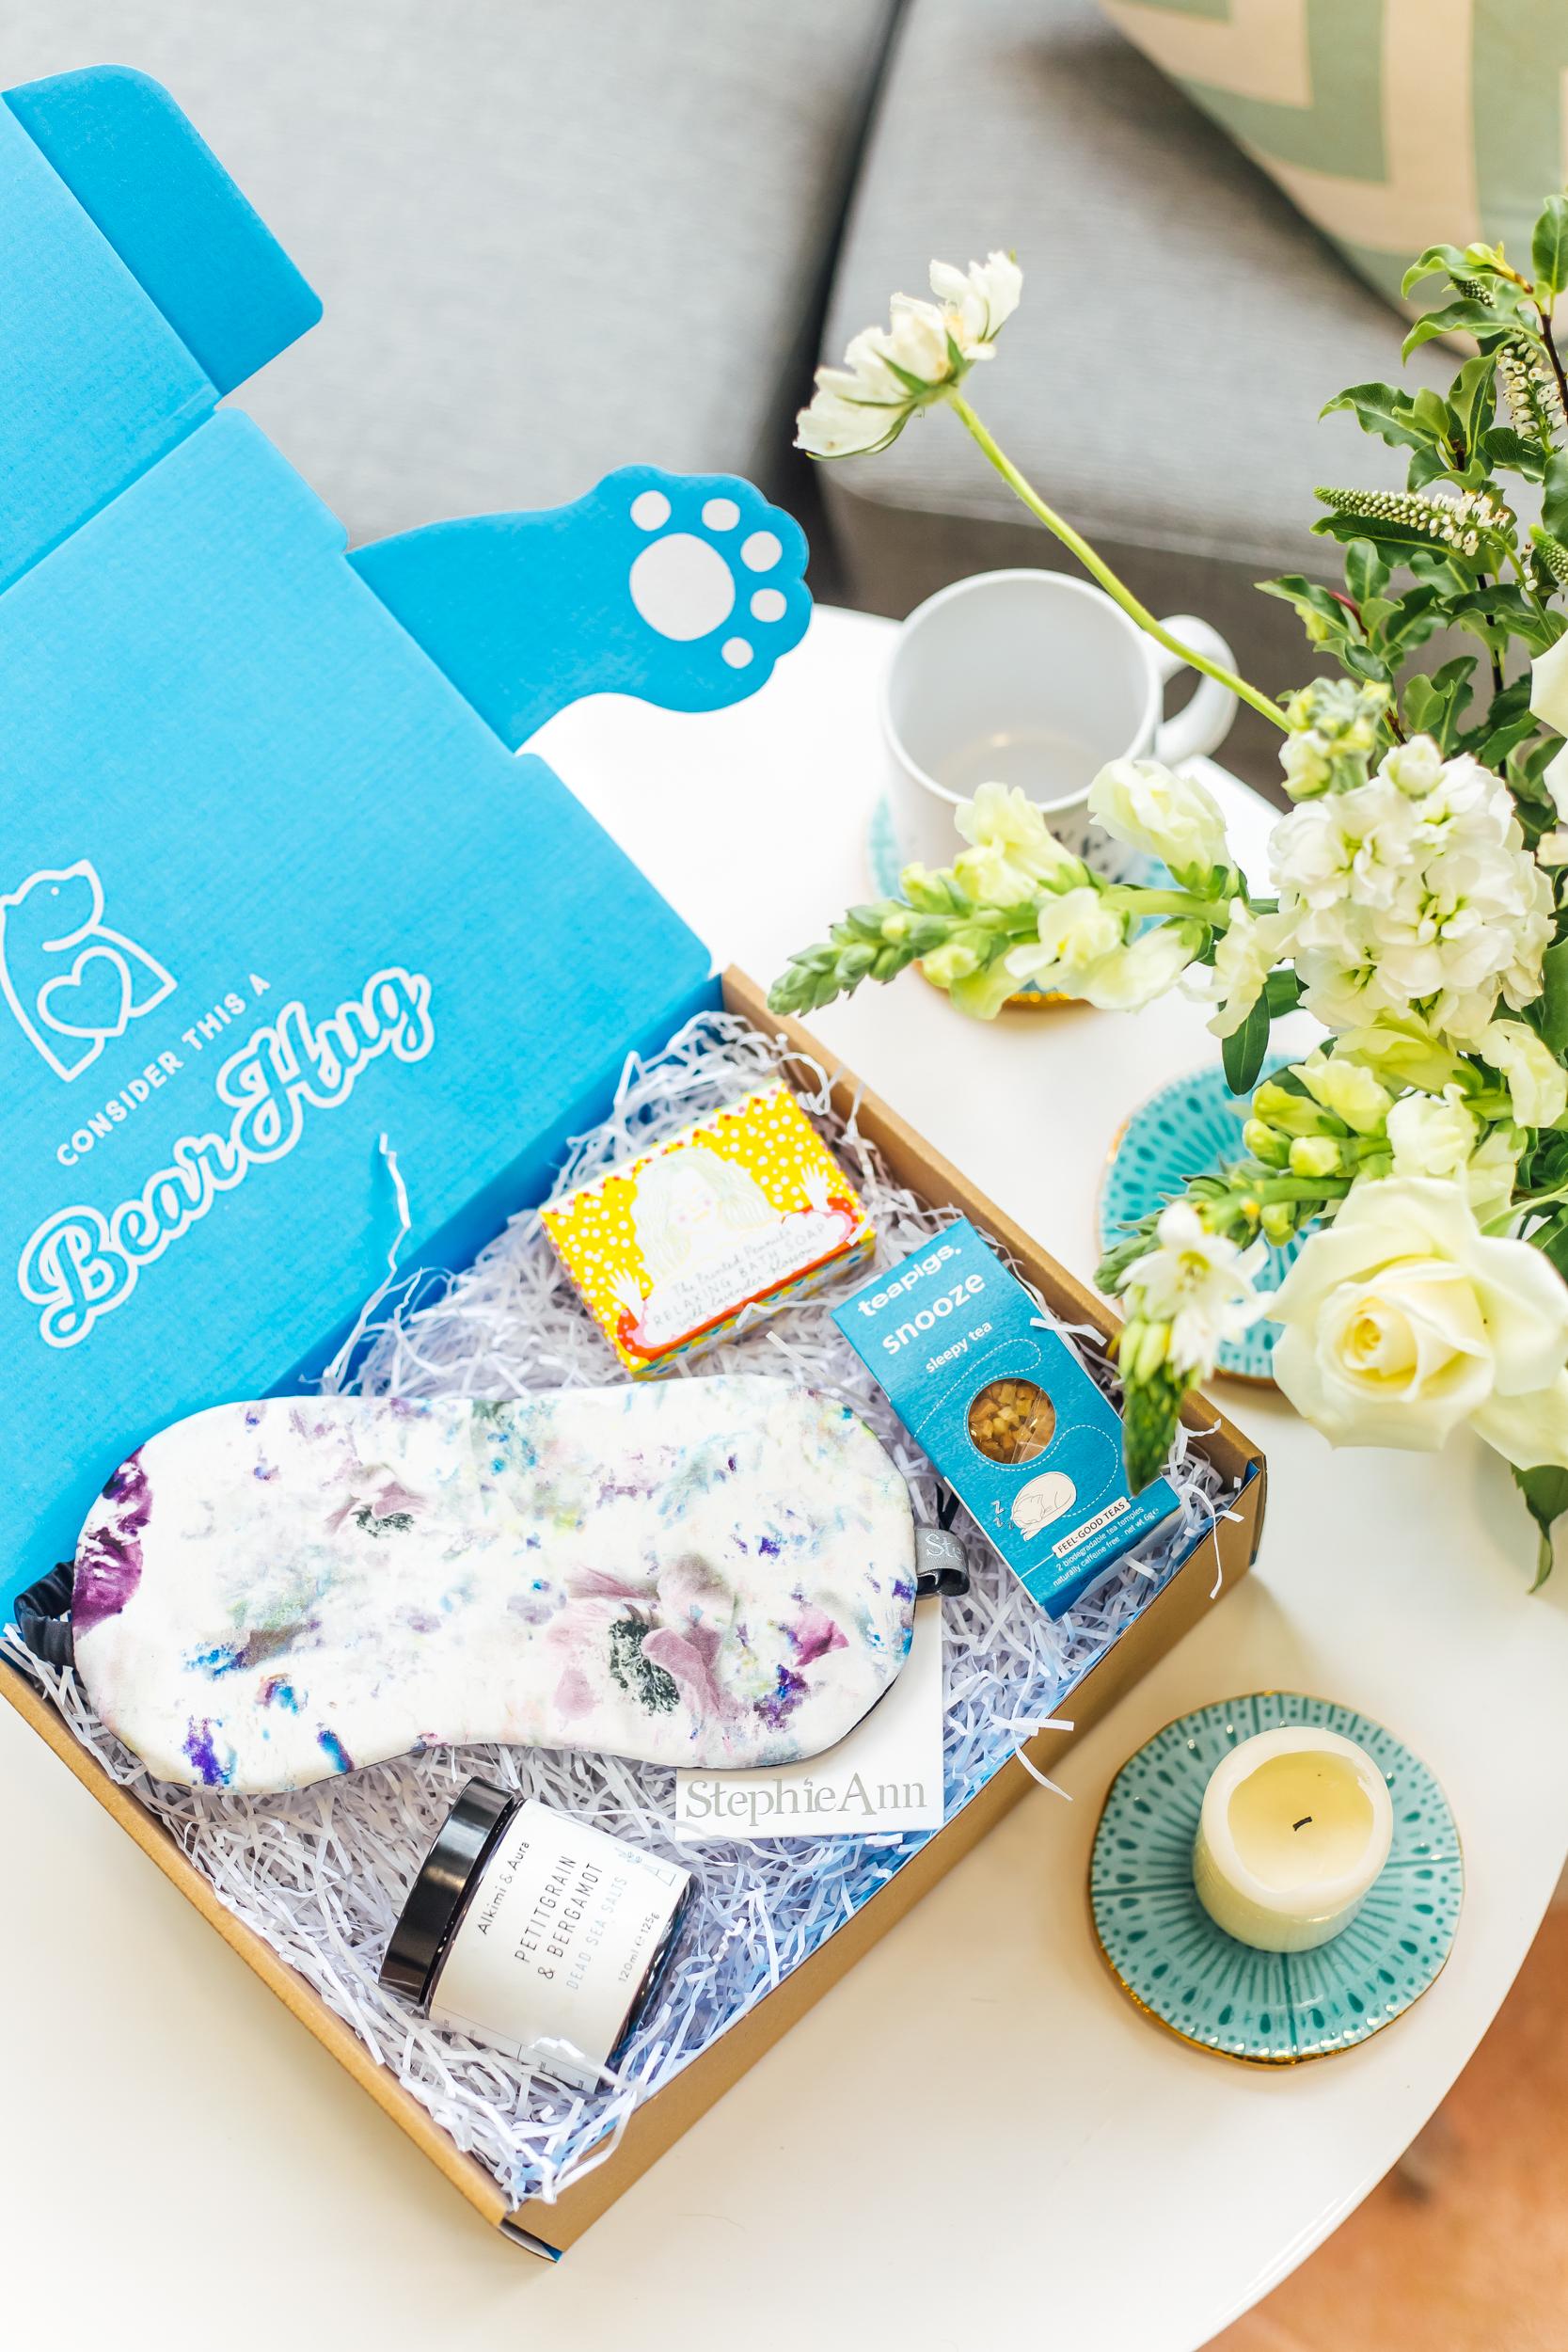 senda bearhug for mothers day gift ideas for mums